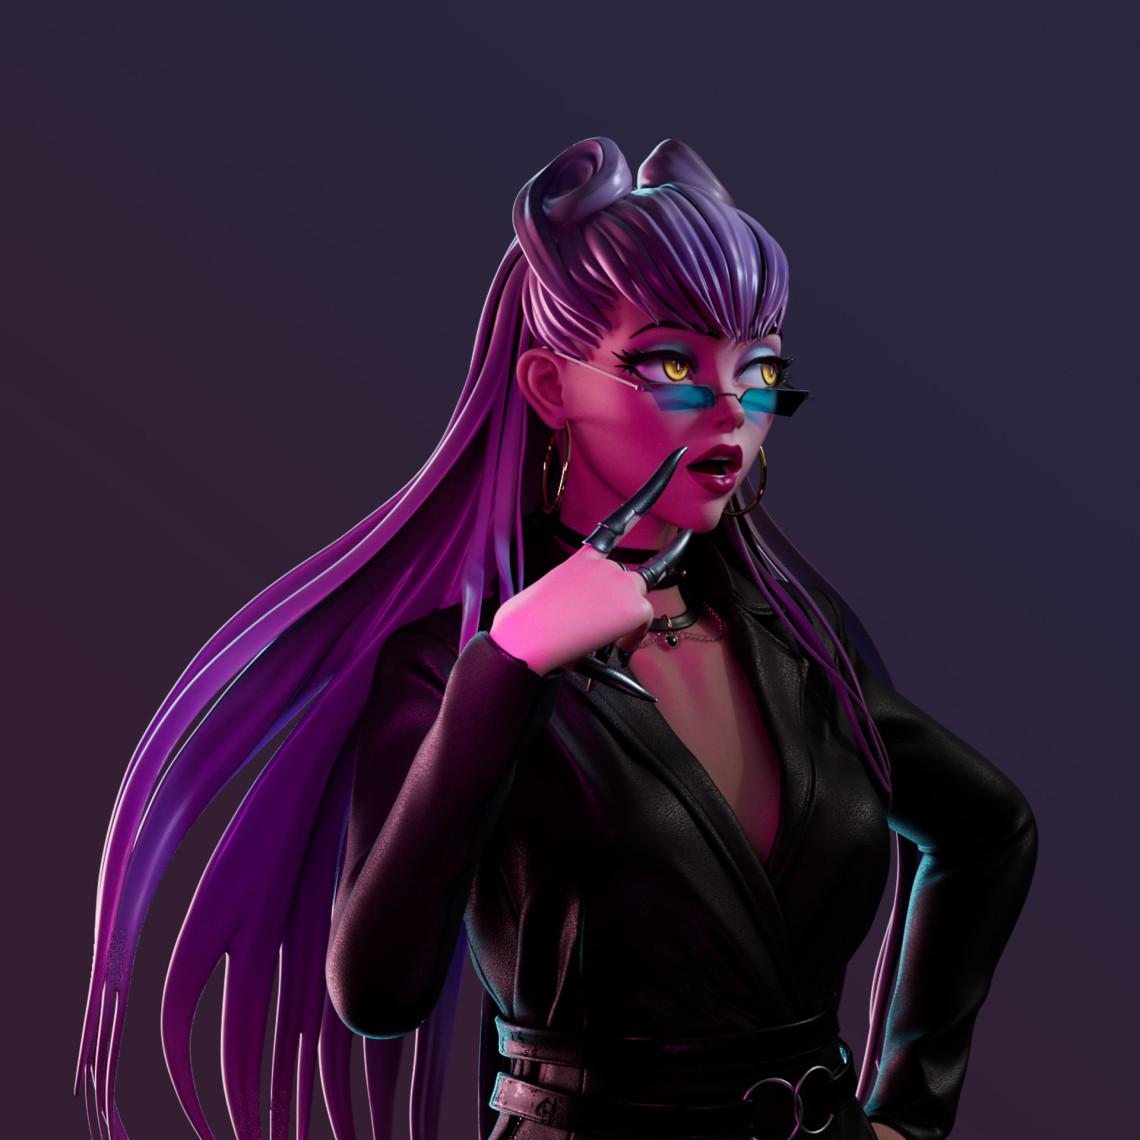 Evelynn    紫色暗黑御姐风格角色设计   设计师:iolacathern